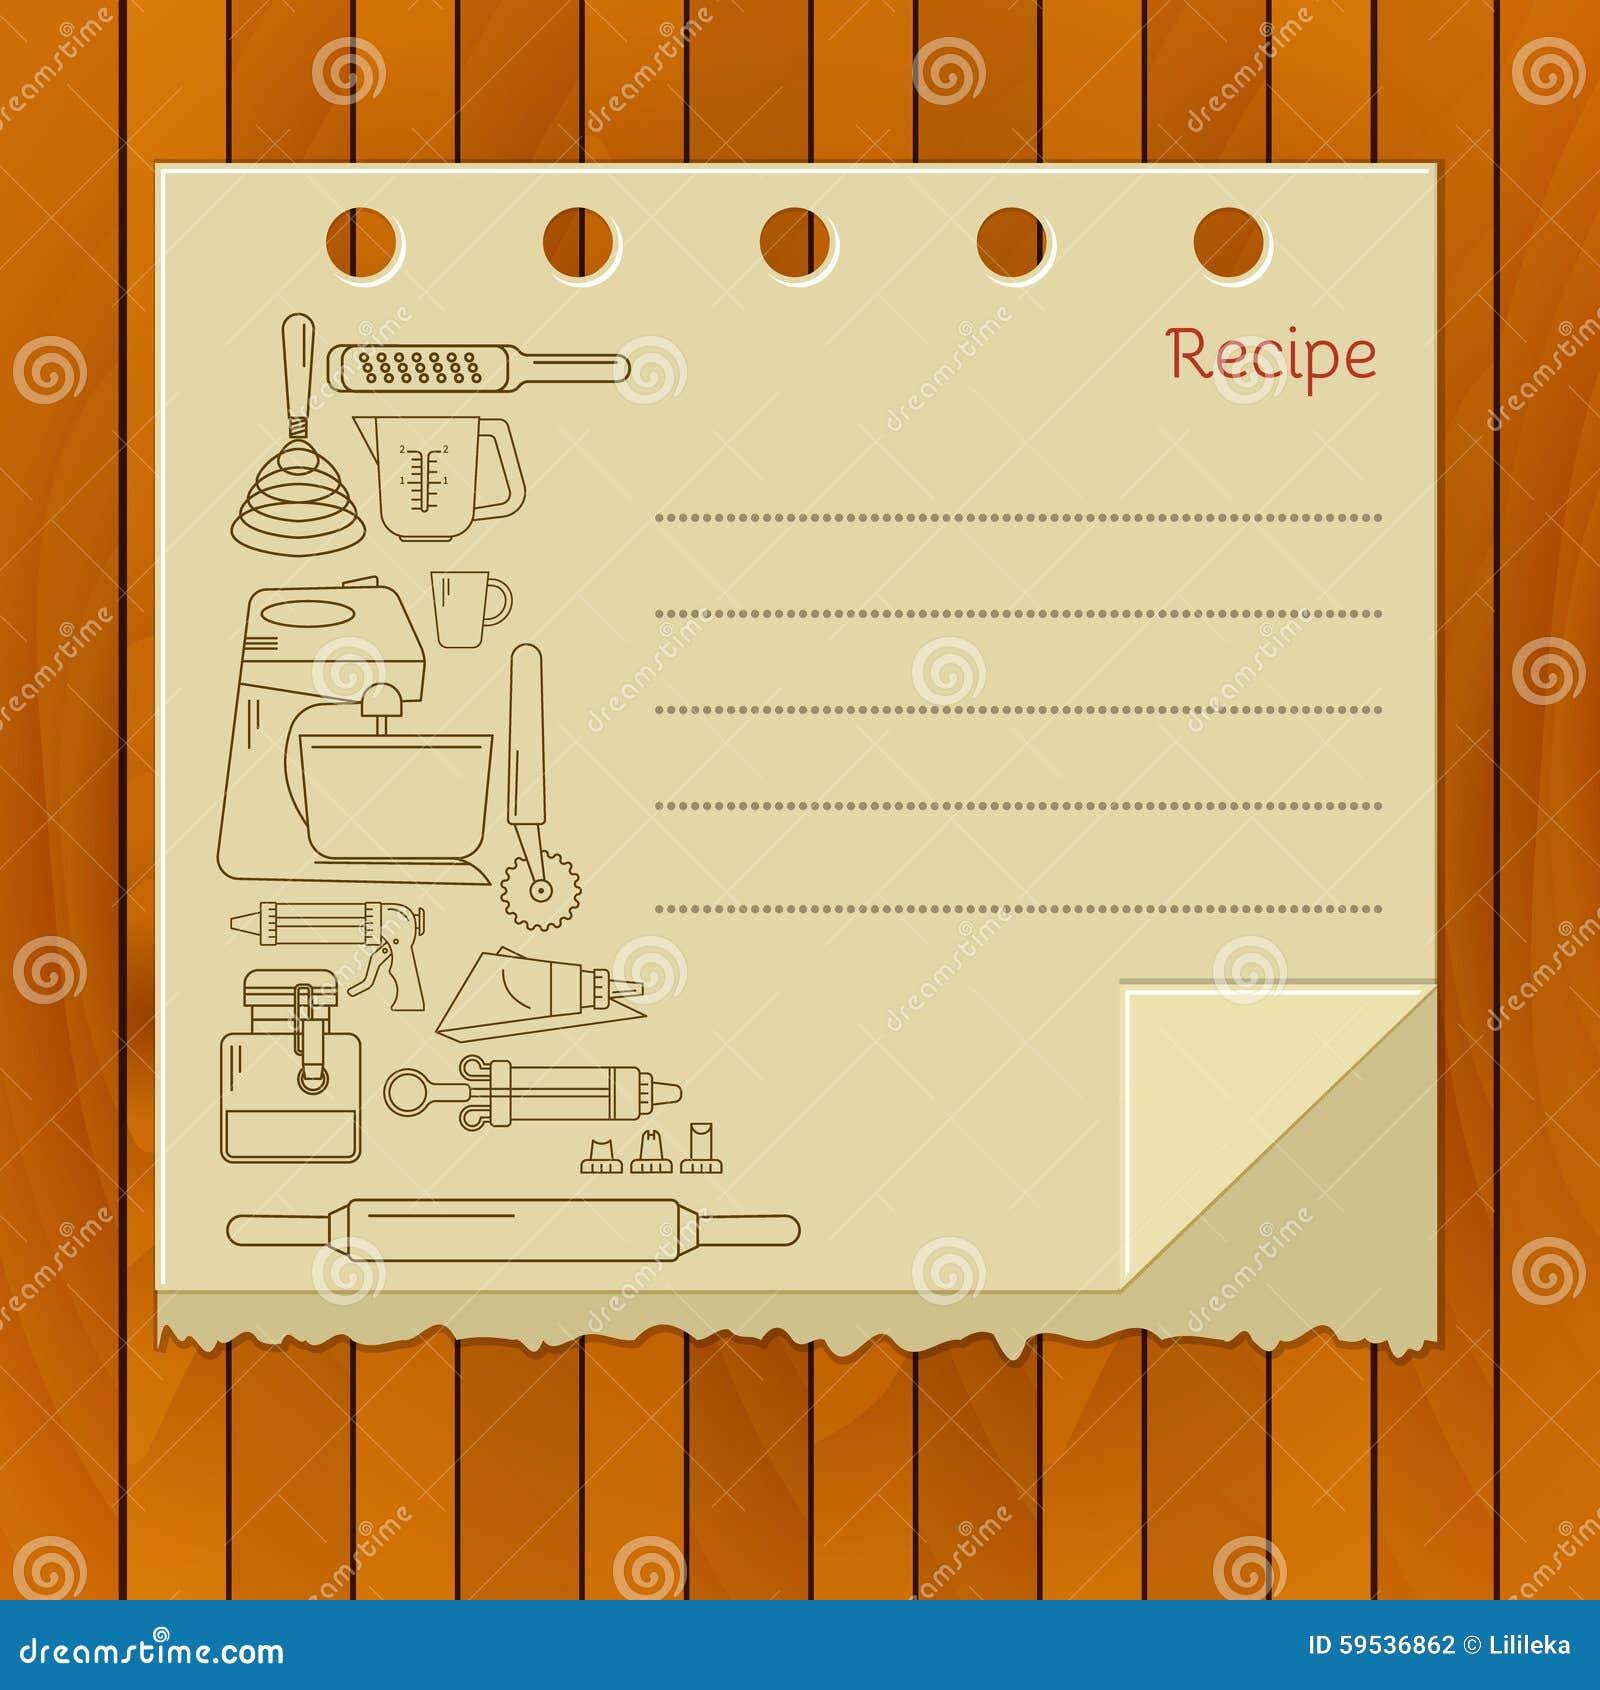 sweet recipe vector card template stock illustration illustration